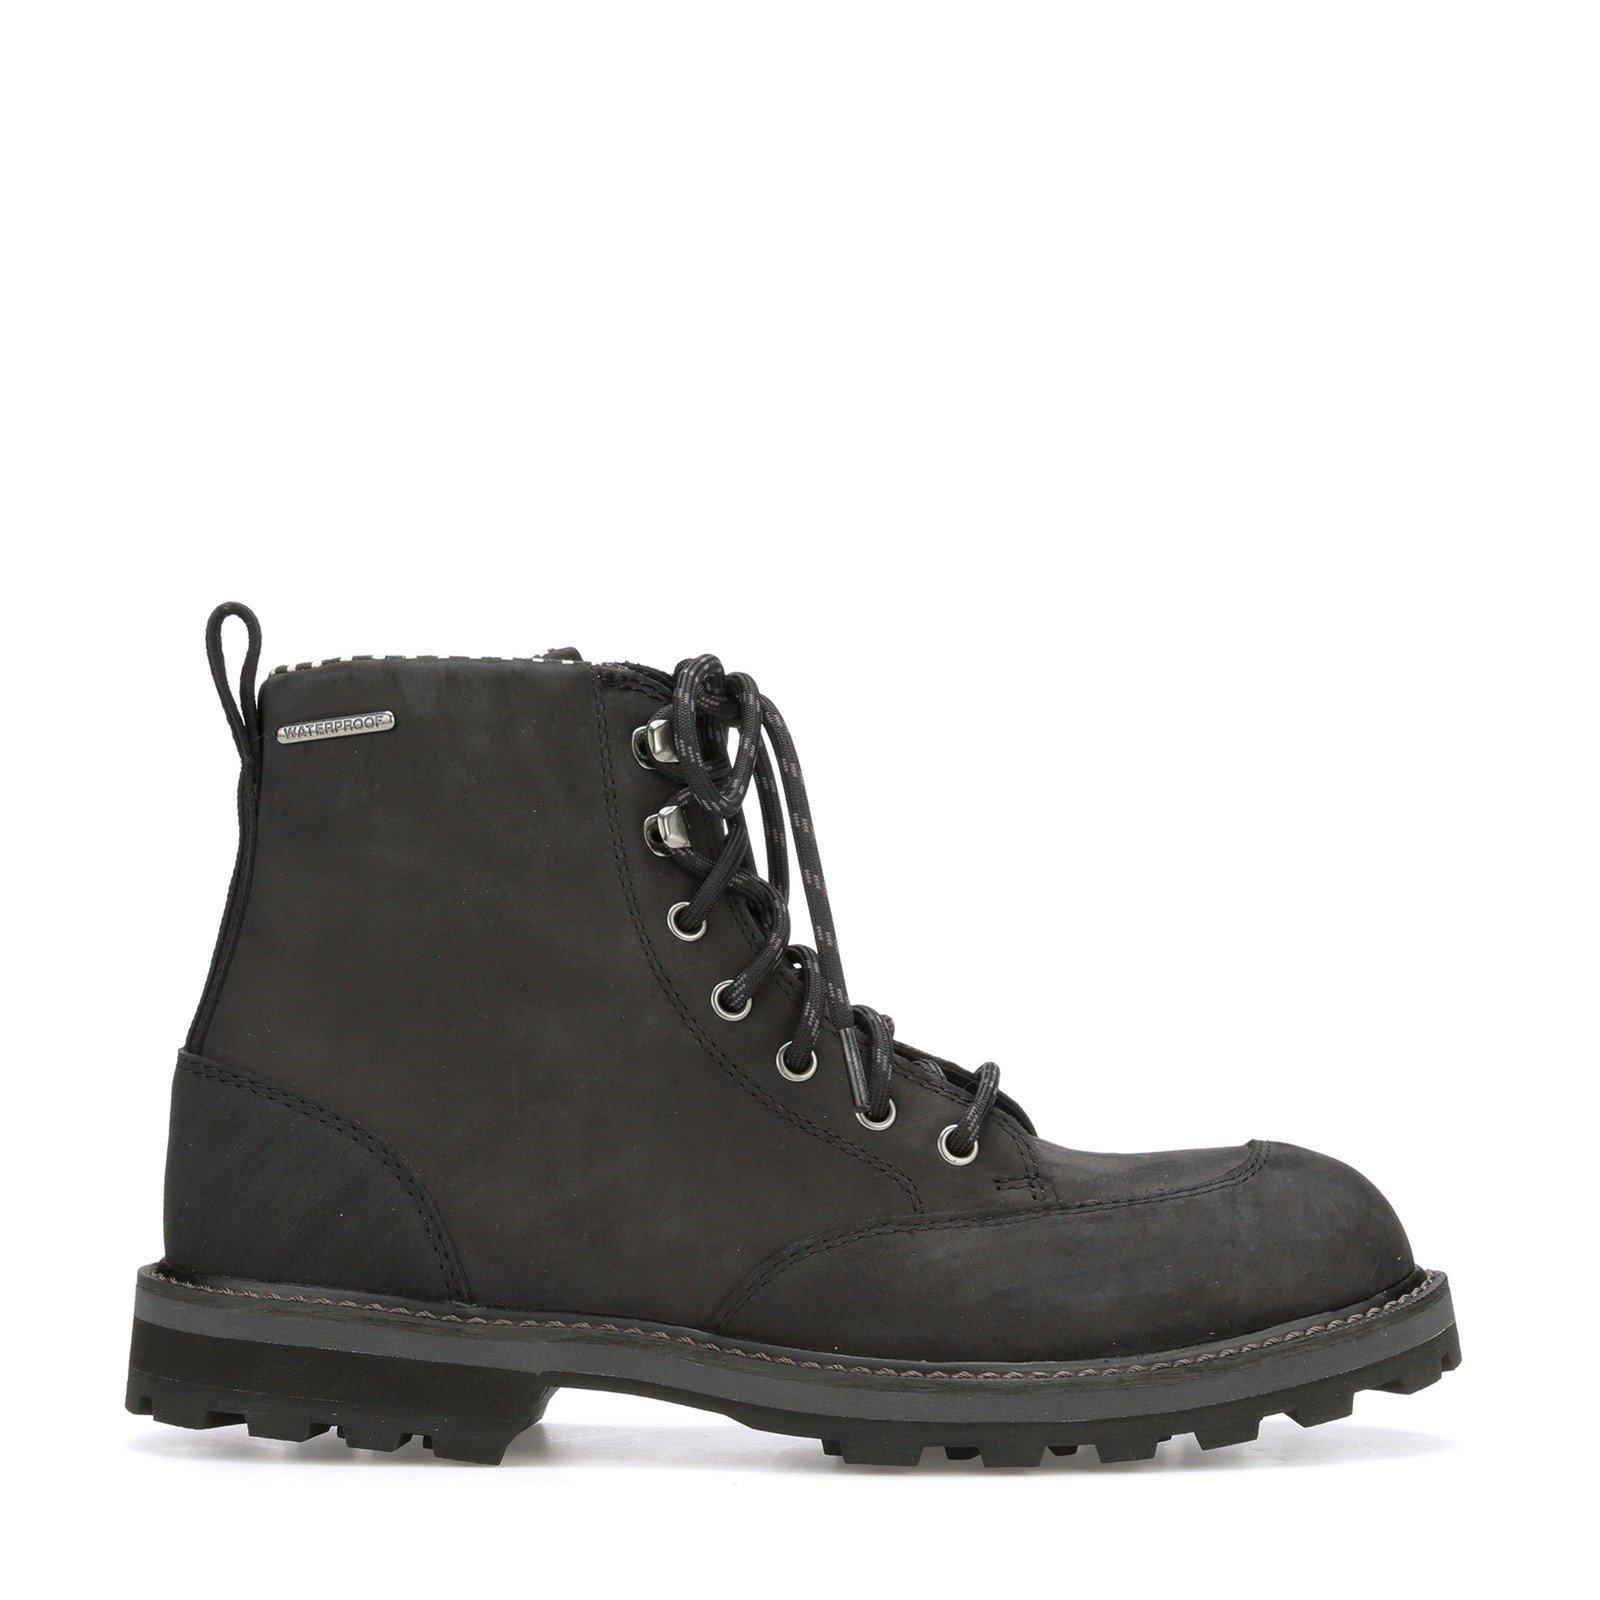 Muck Boots Men's Foreman Boot Black 31854 - Black 12